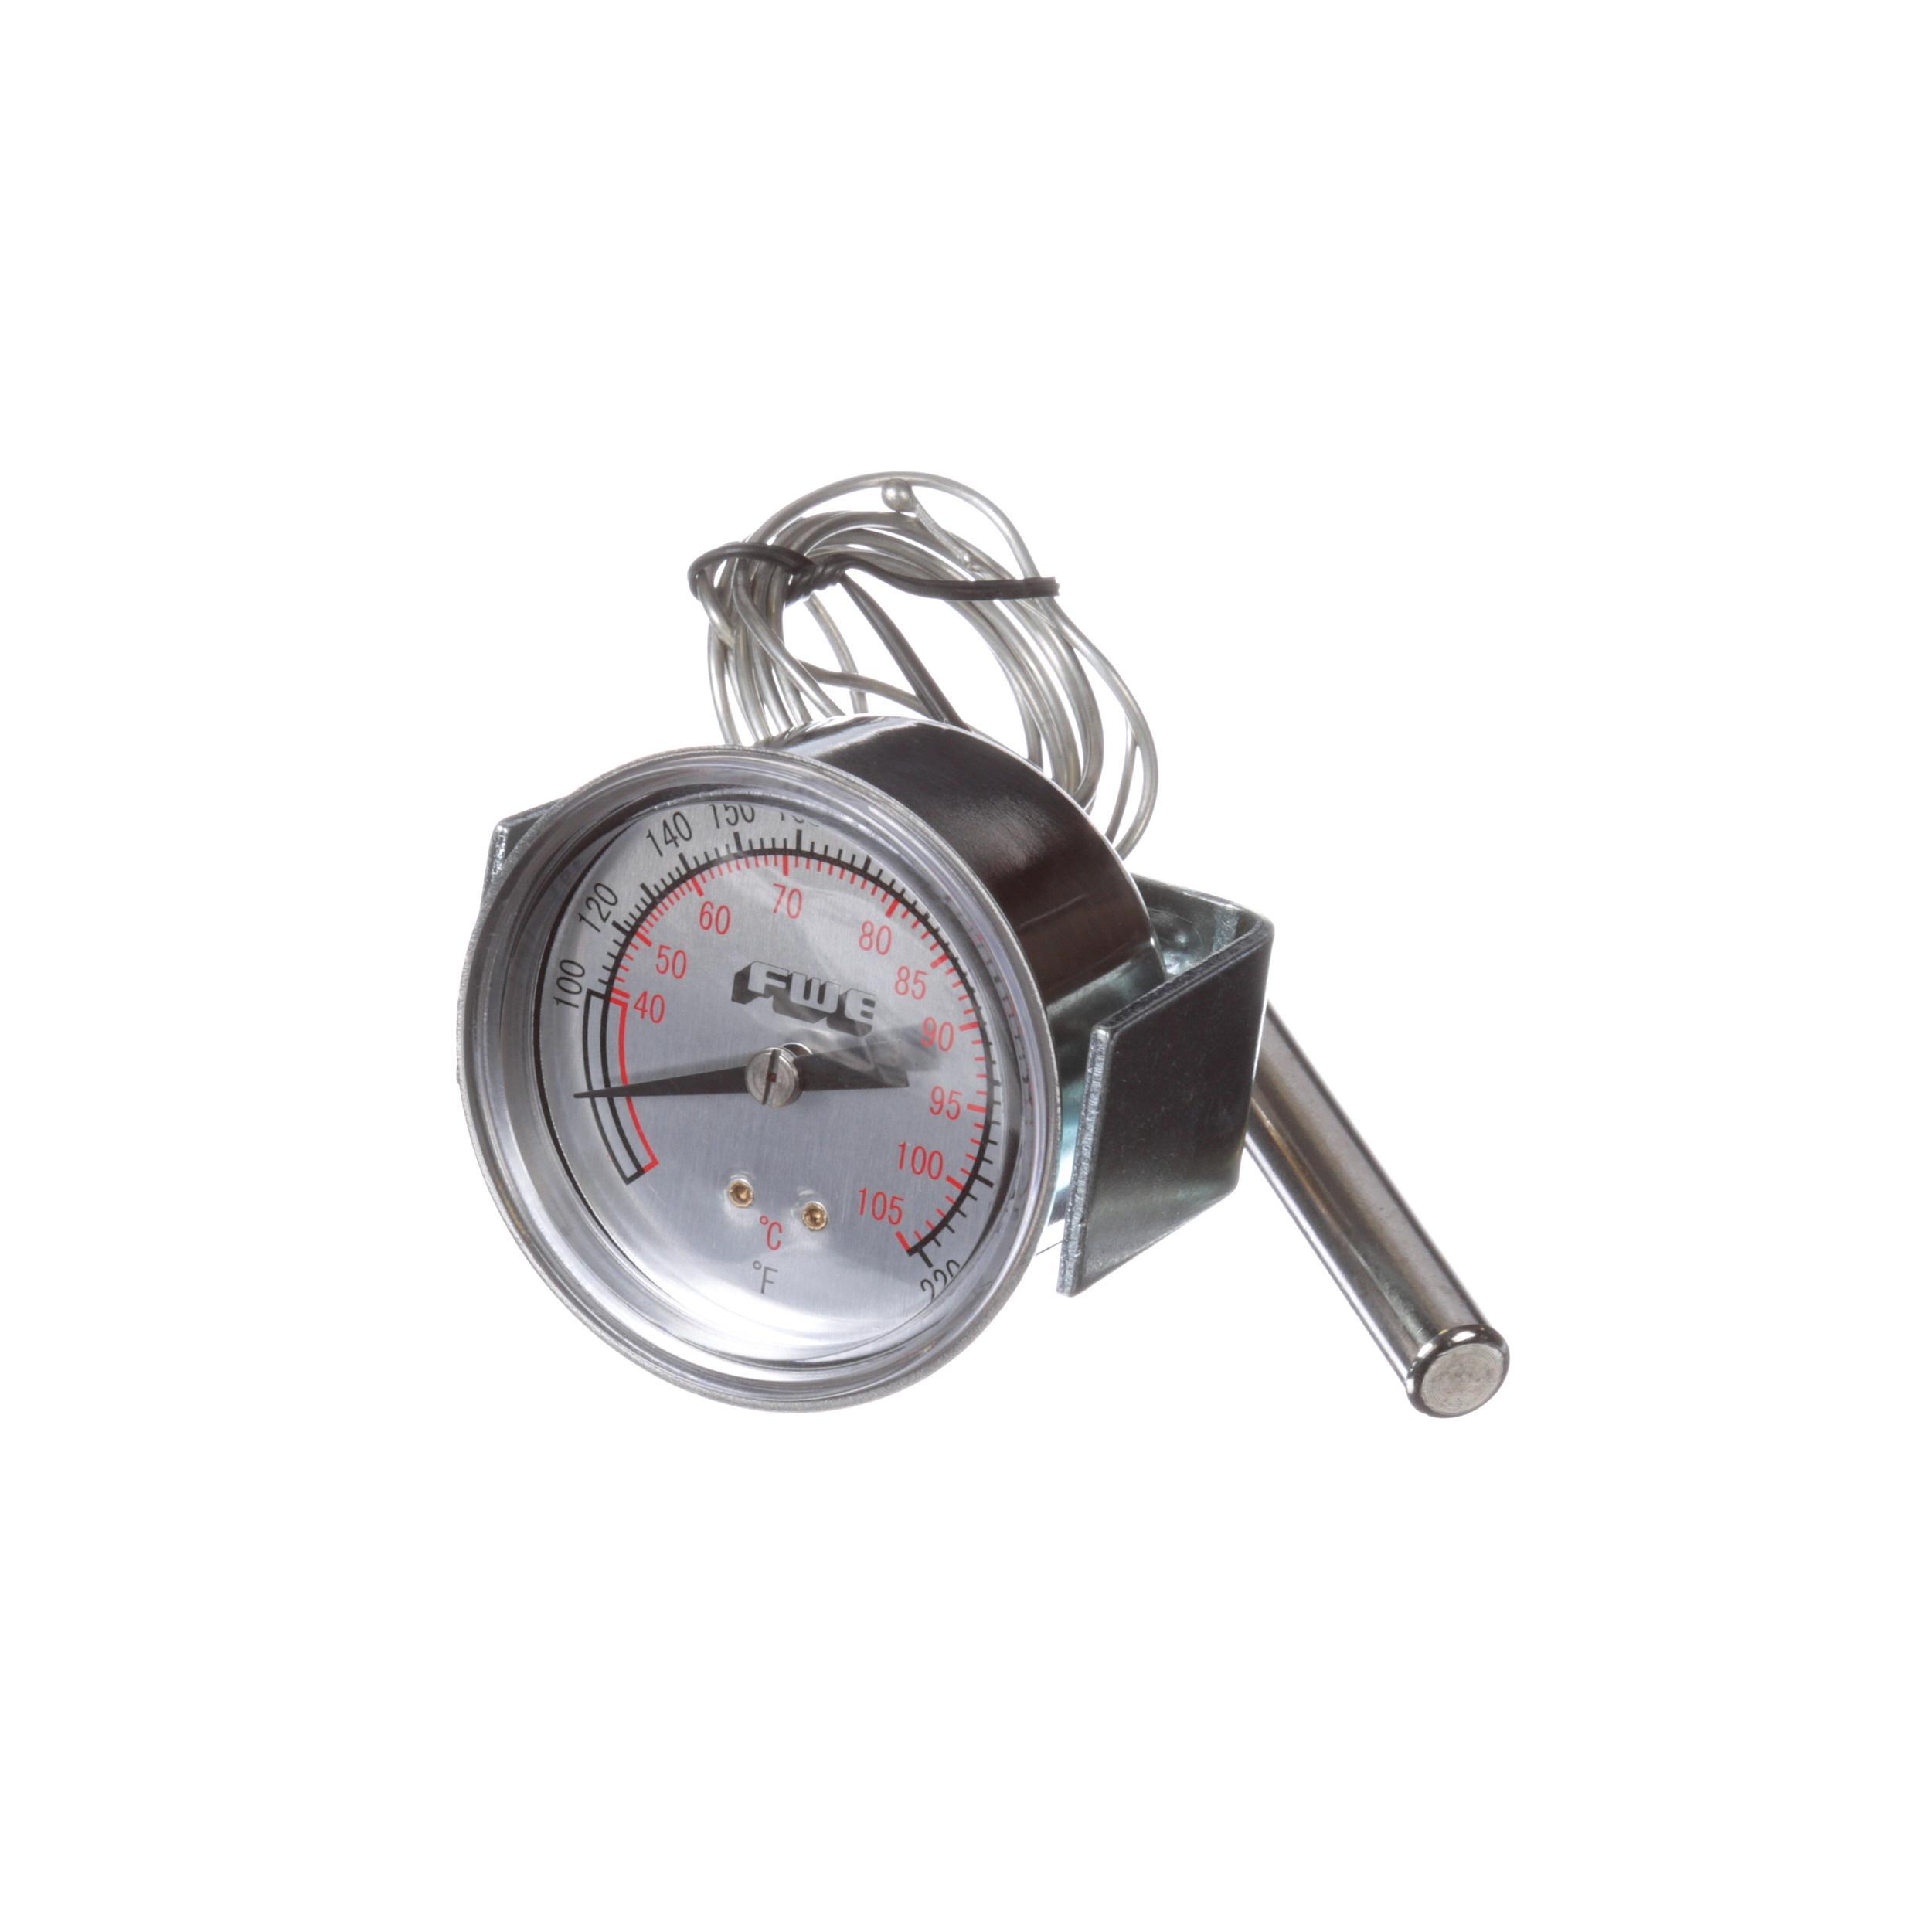 Array - meter miser compressor manual  rh   meter miser compressor manual manualspath com